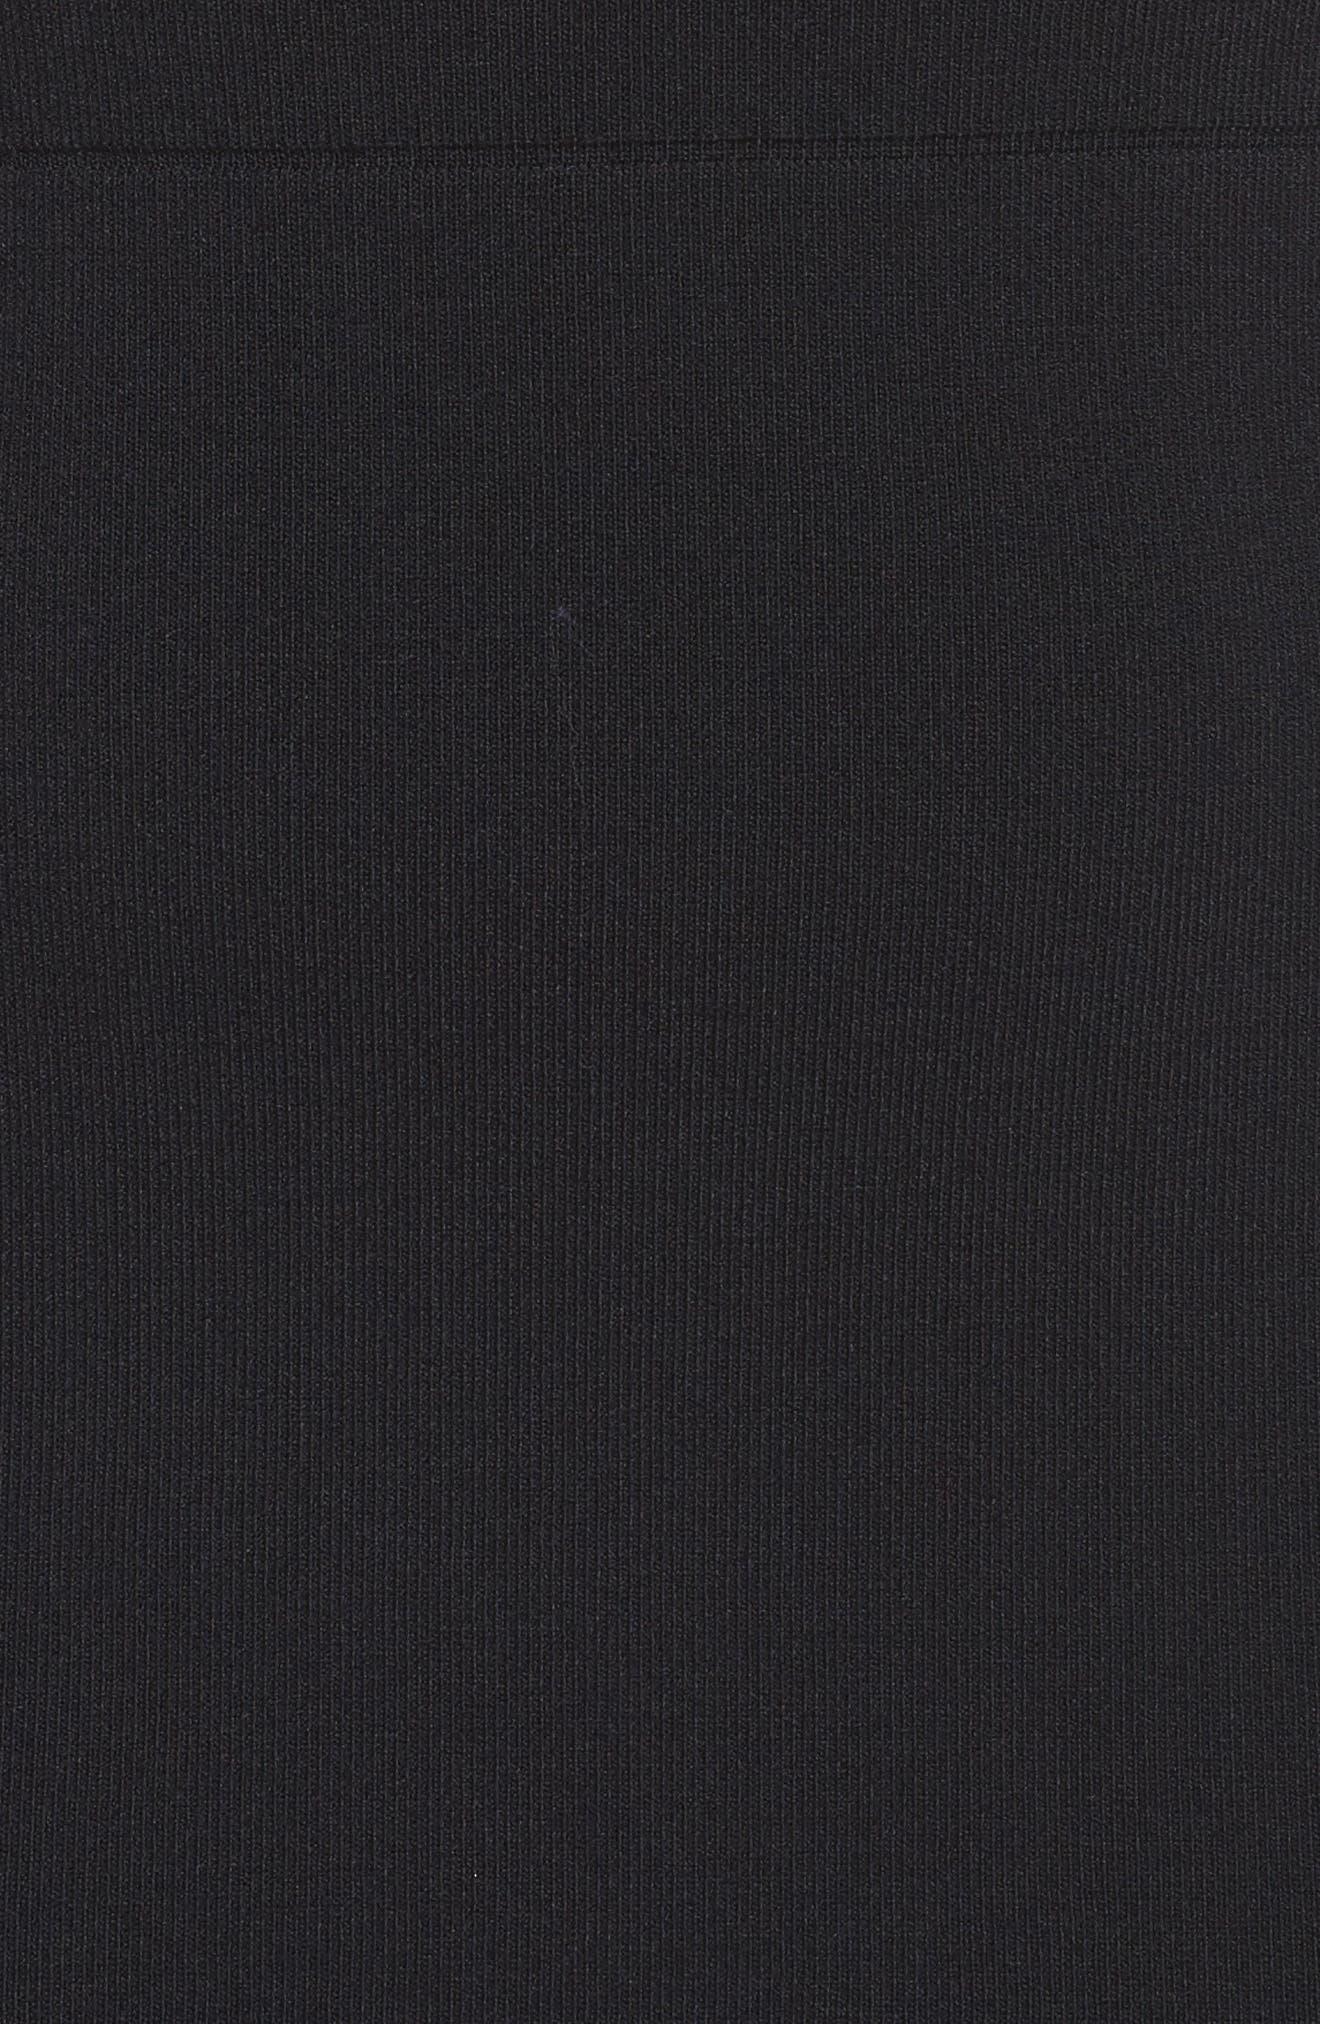 Sheer Inset Knit Sheath Dress,                             Alternate thumbnail 5, color,                             001